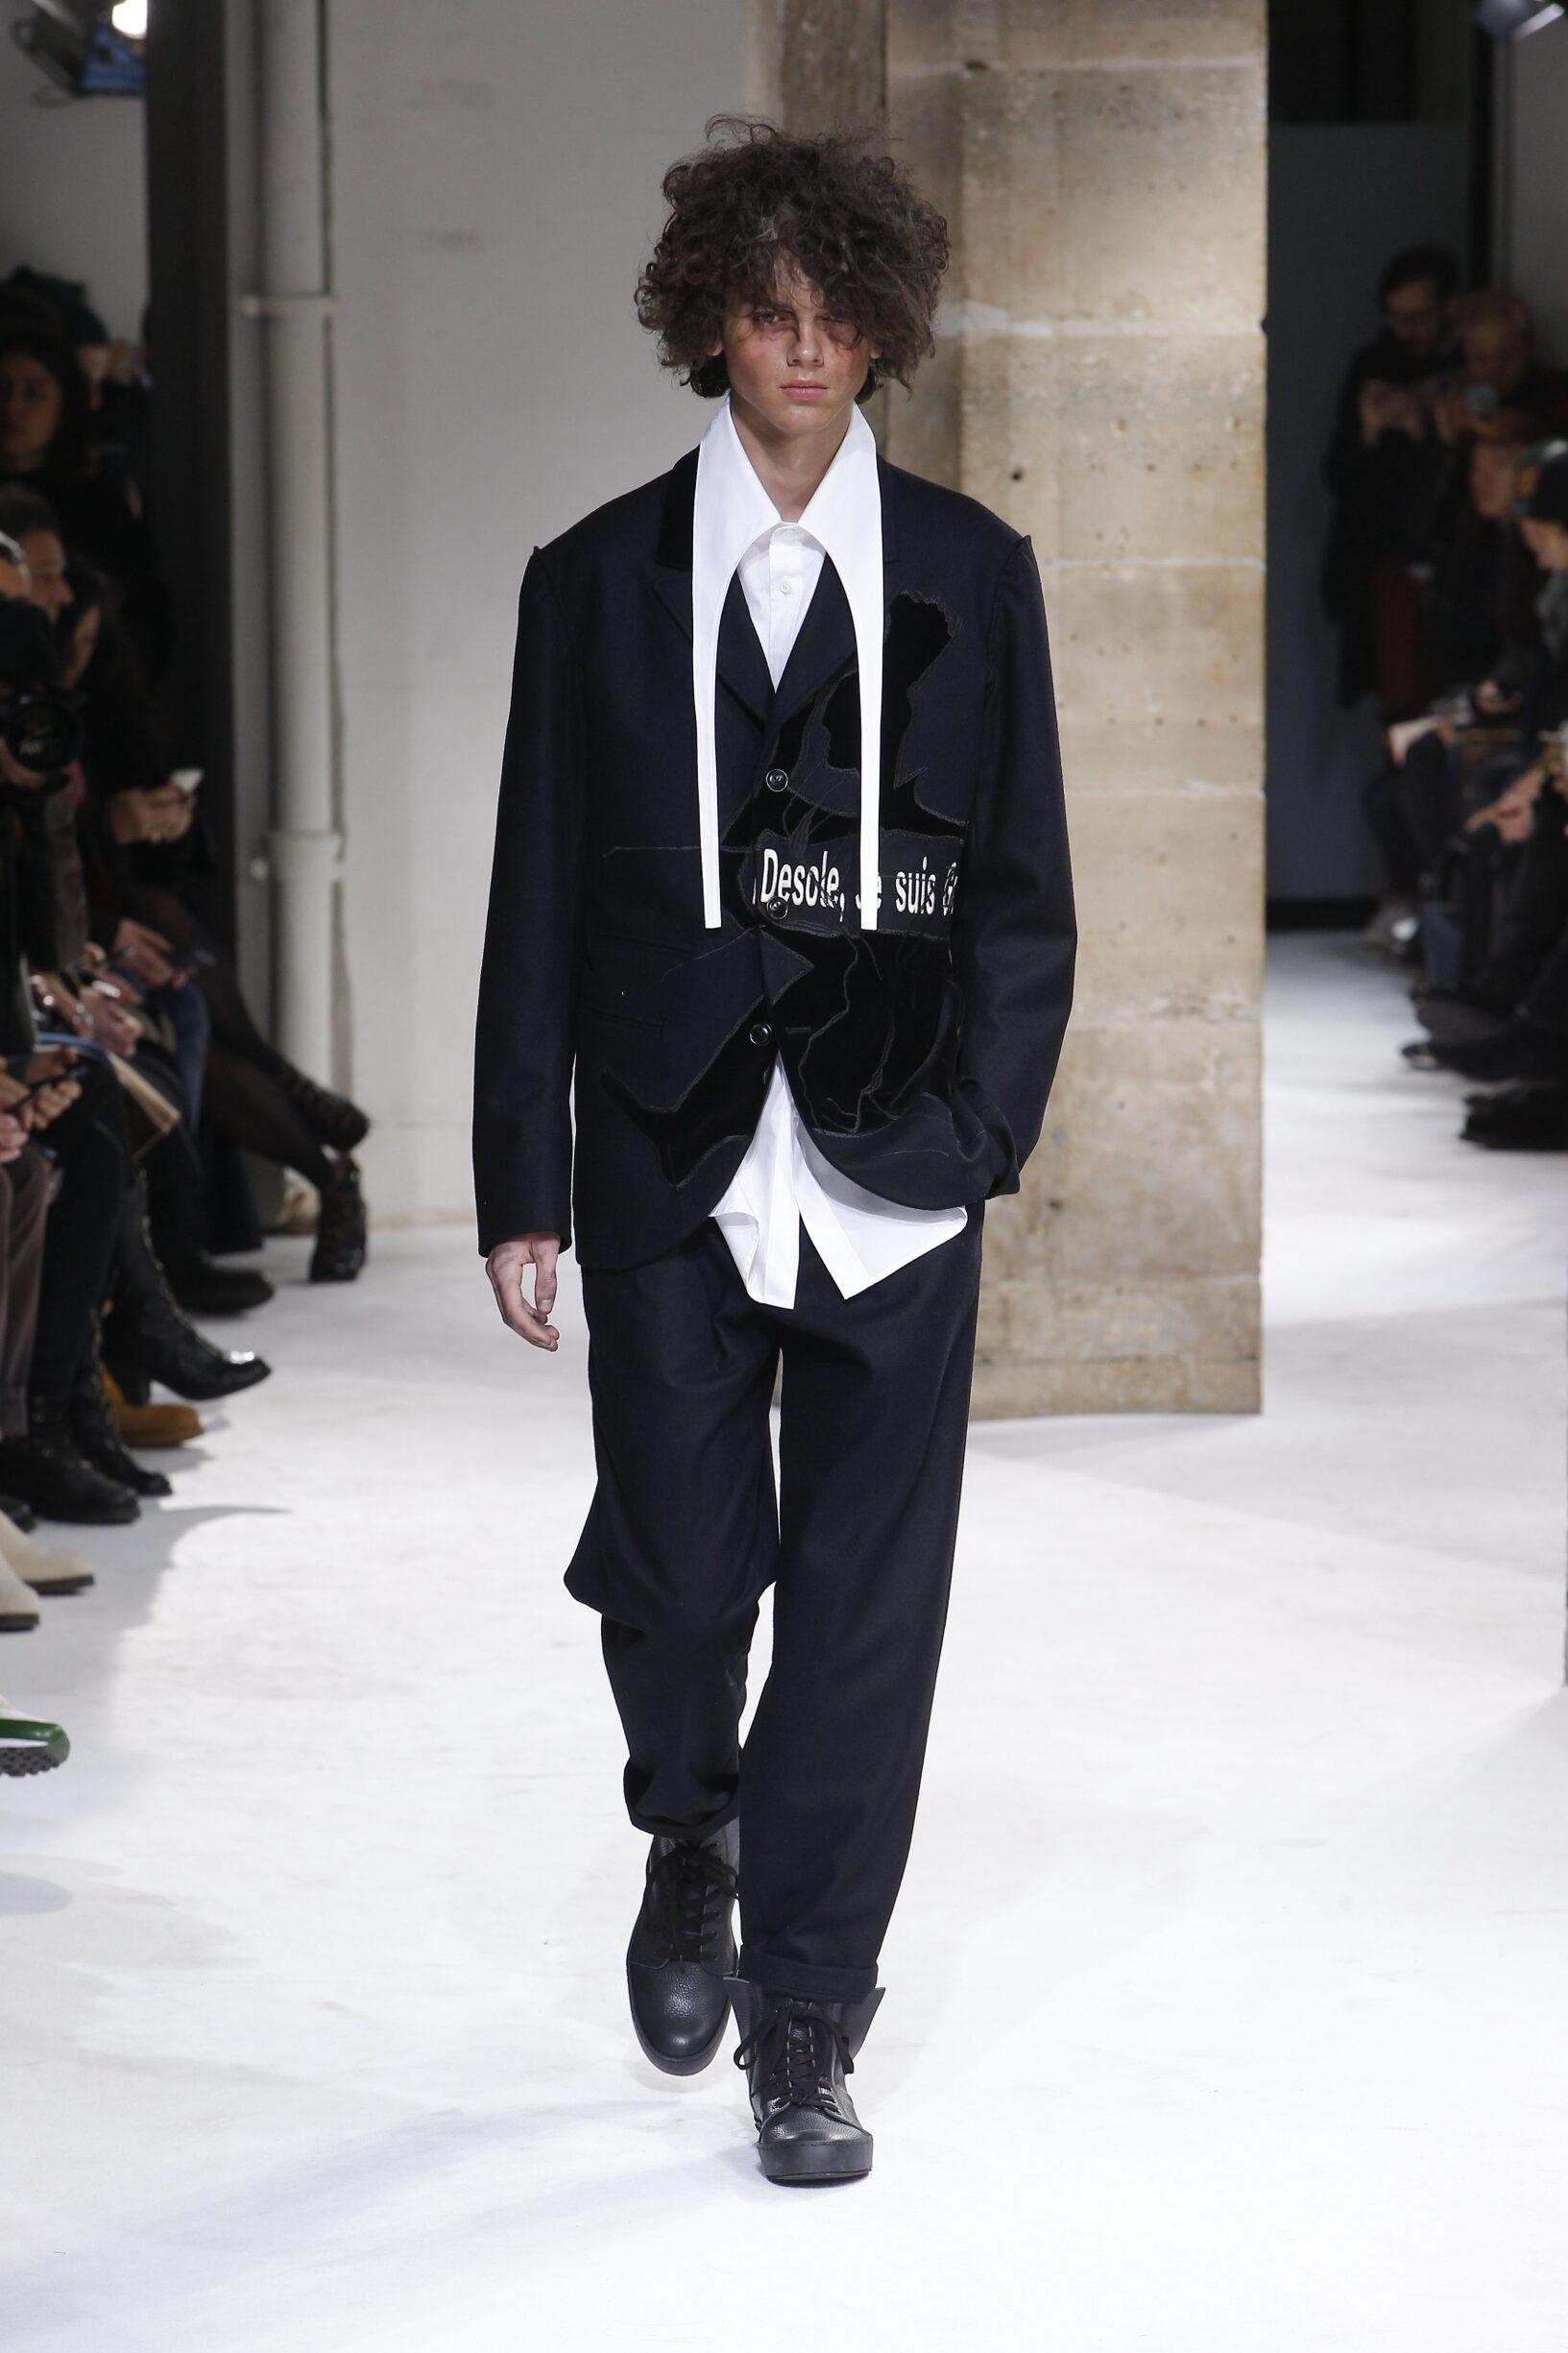 Runway Yohji Yamamoto Fall Winter 2017 Men's Collection Paris Fashion Week